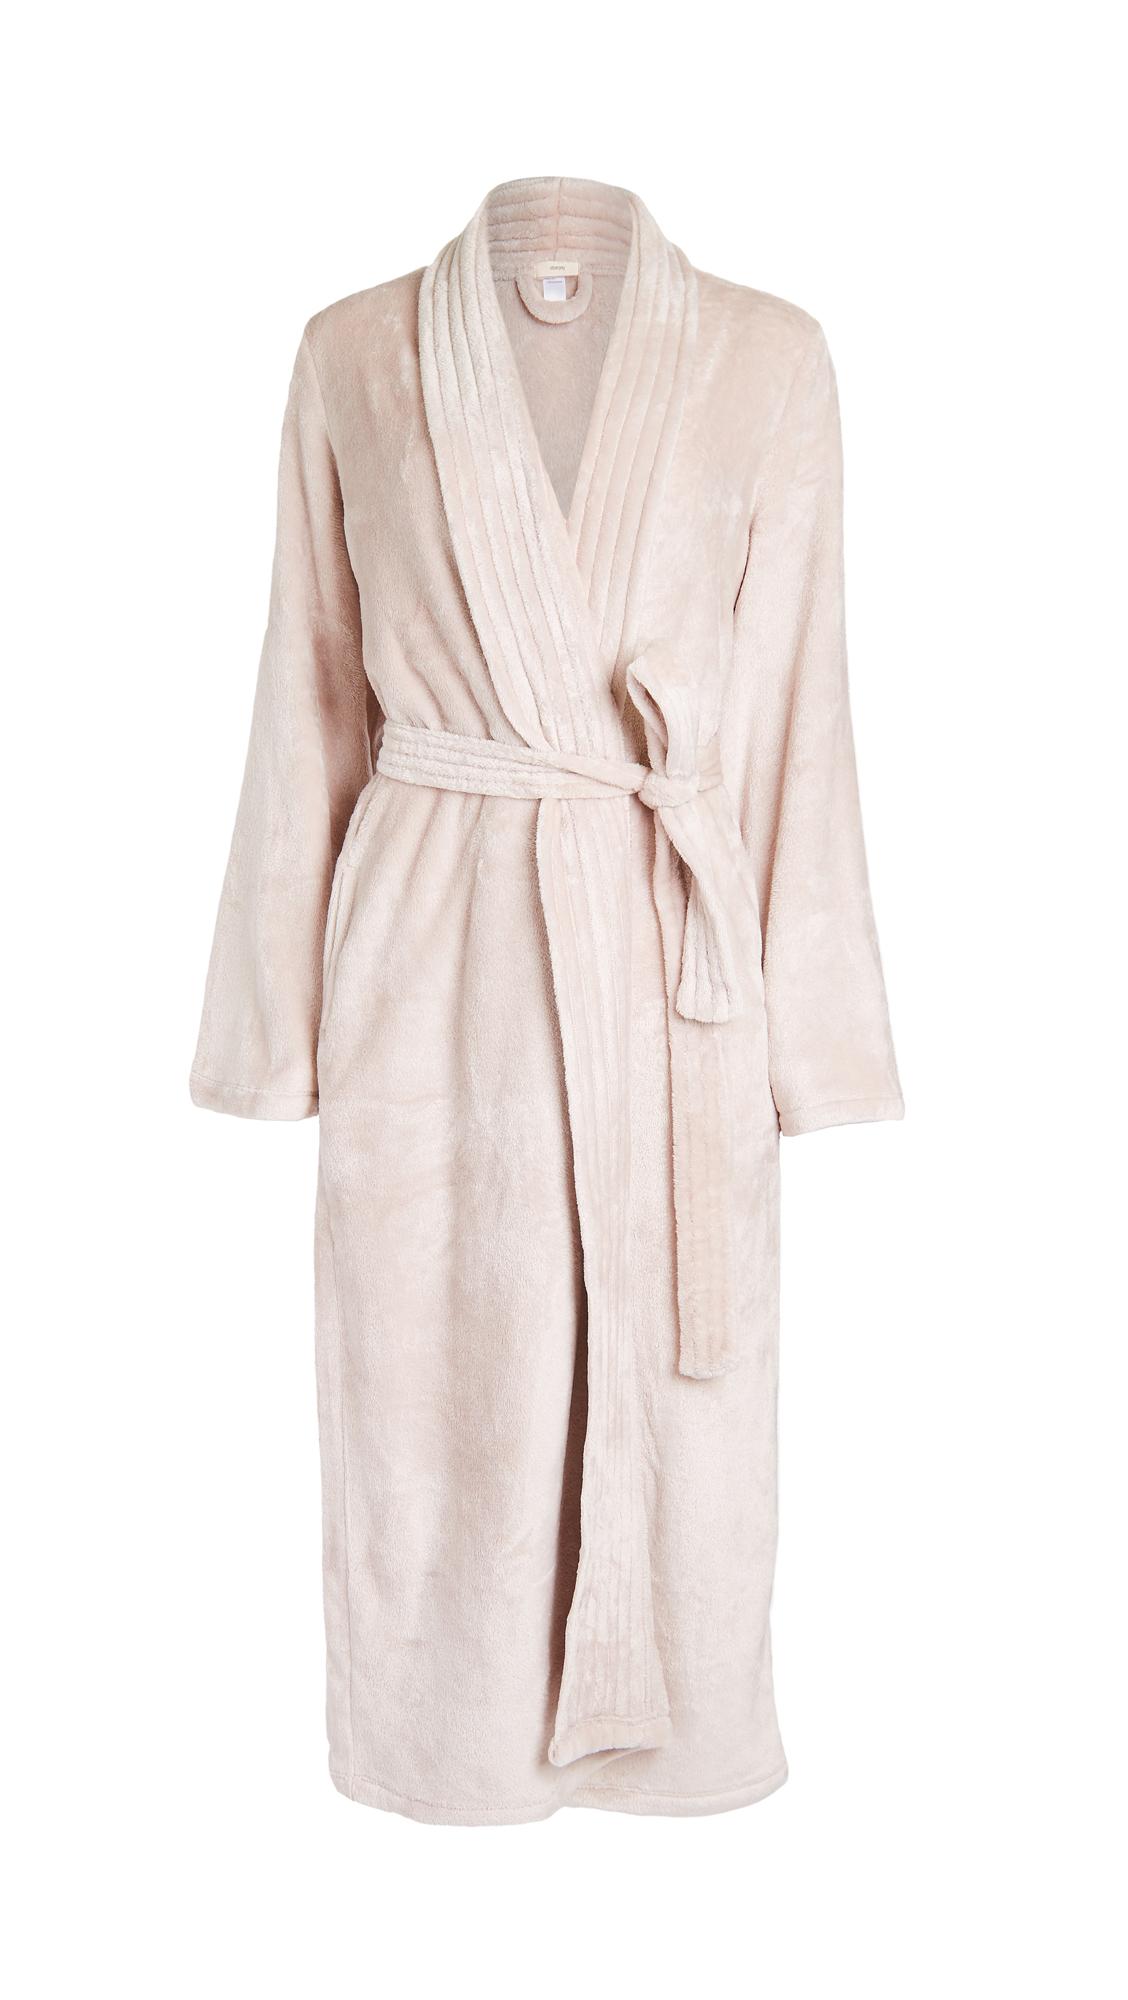 Eberjey Chalet The Plush Robe